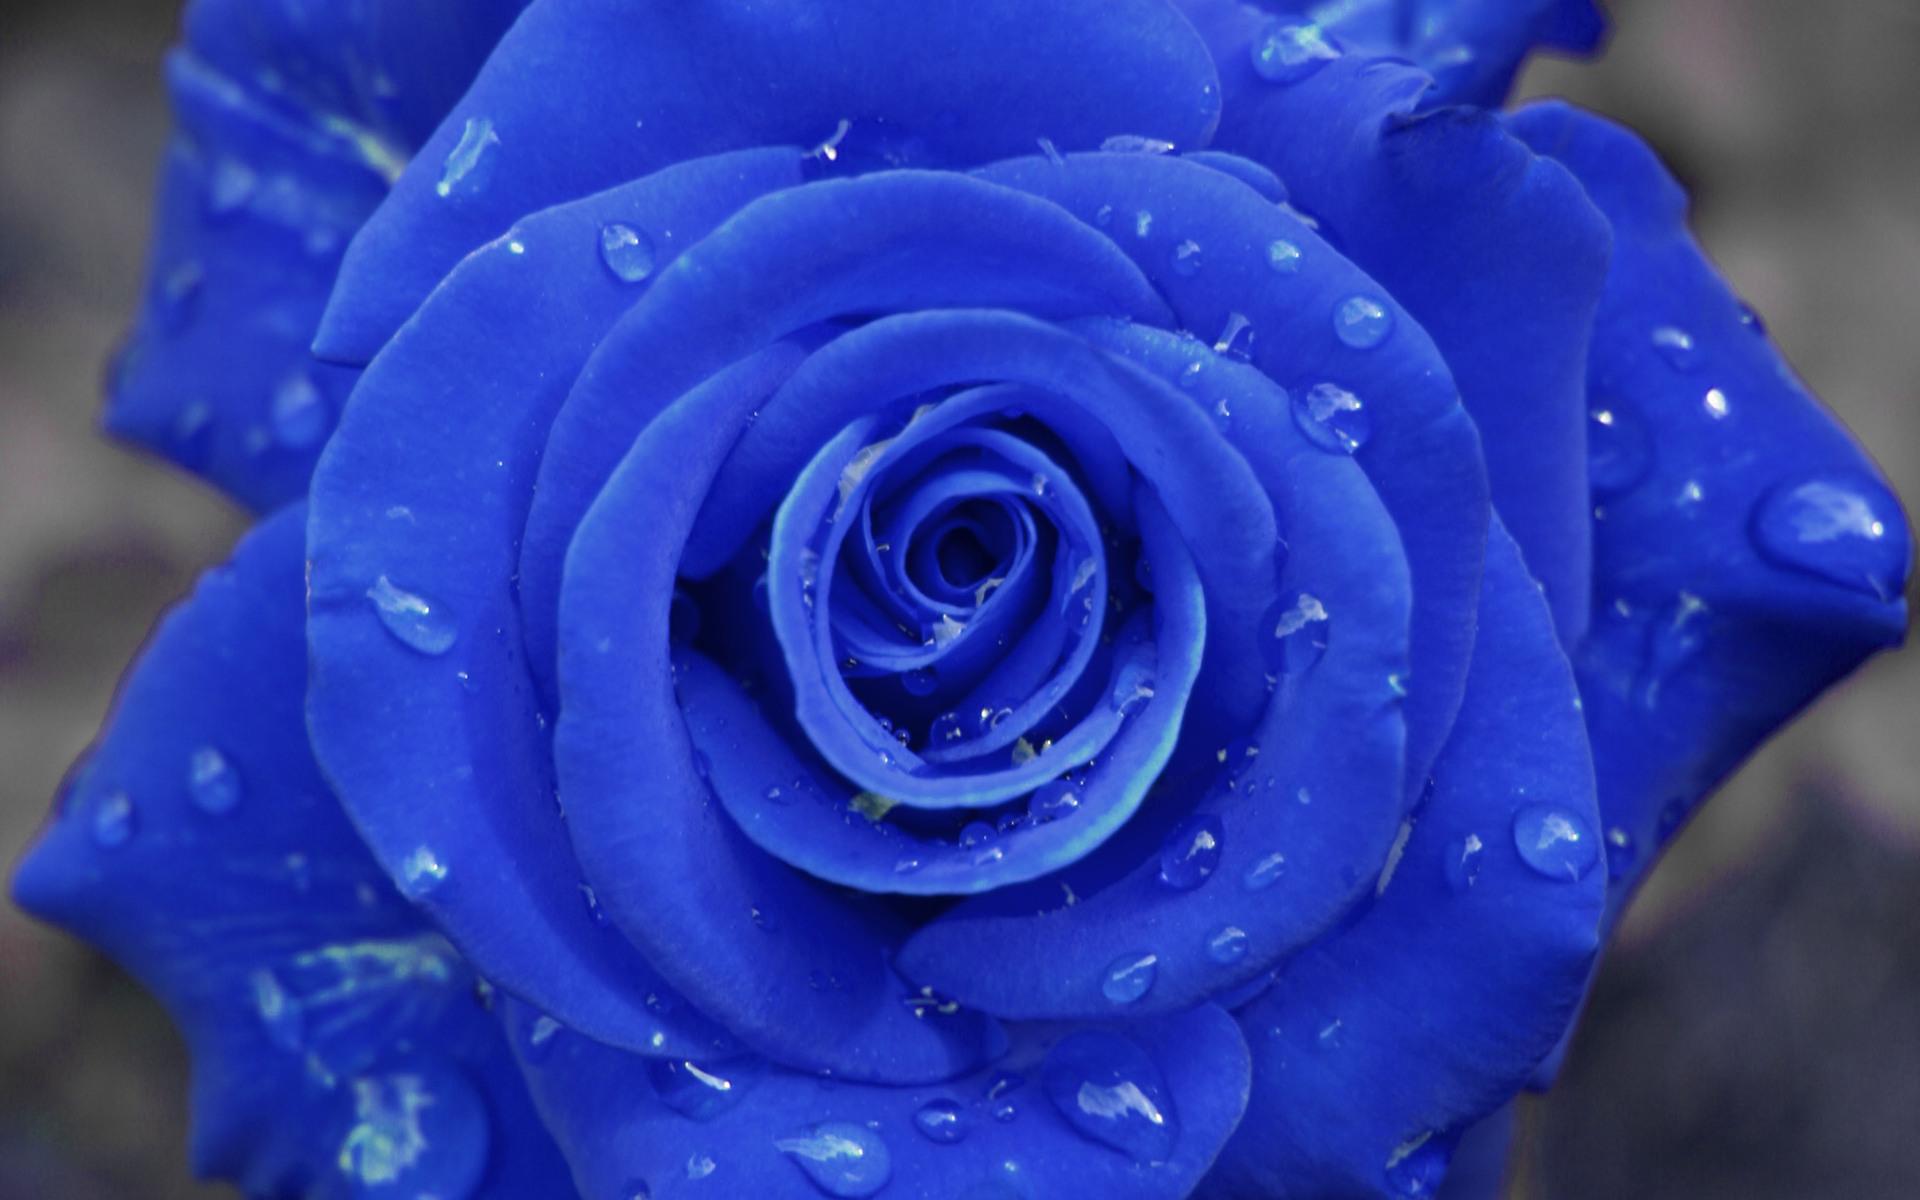 Blue Rose | 1920 x 1200 | Download | Close